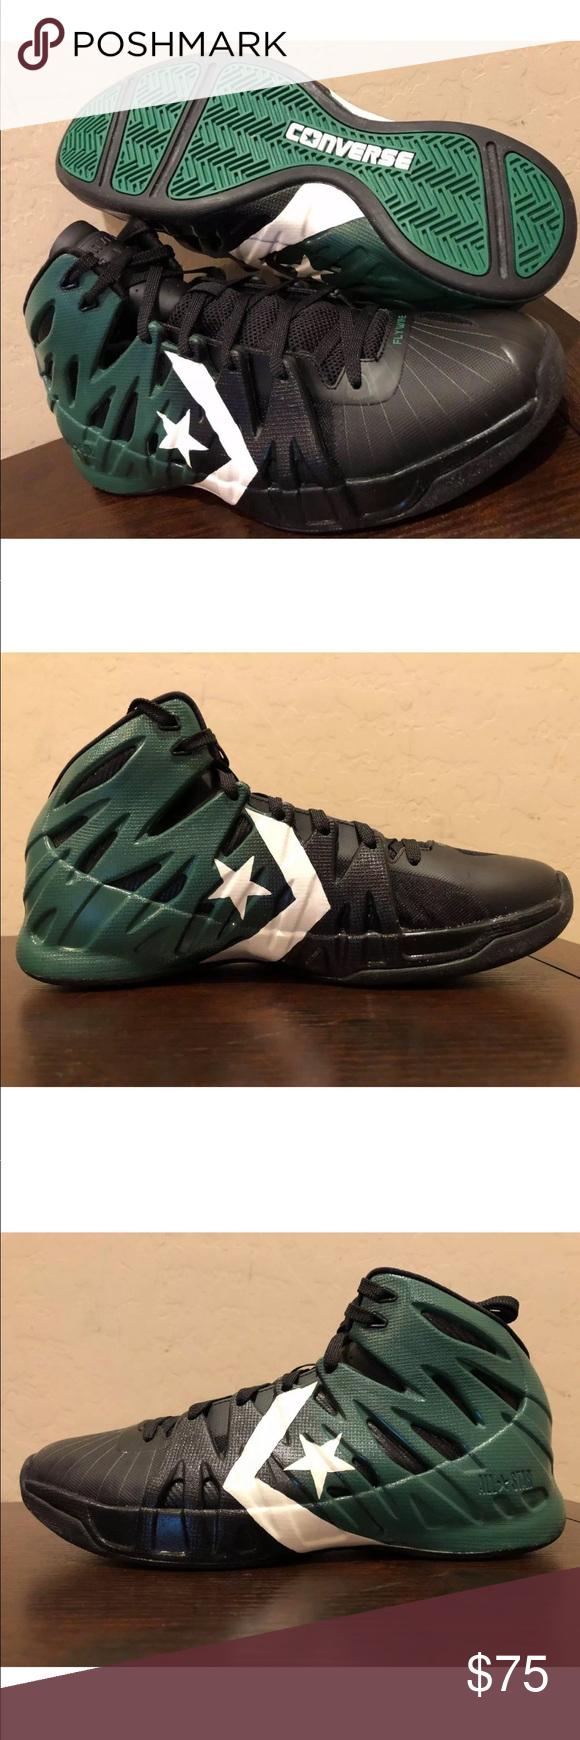 Men s Converse All Star MVP Mid Flywire Basketball NEW AUTHENTIC Converse  MVP MID Basketball Shoes MEN S 0c389659e